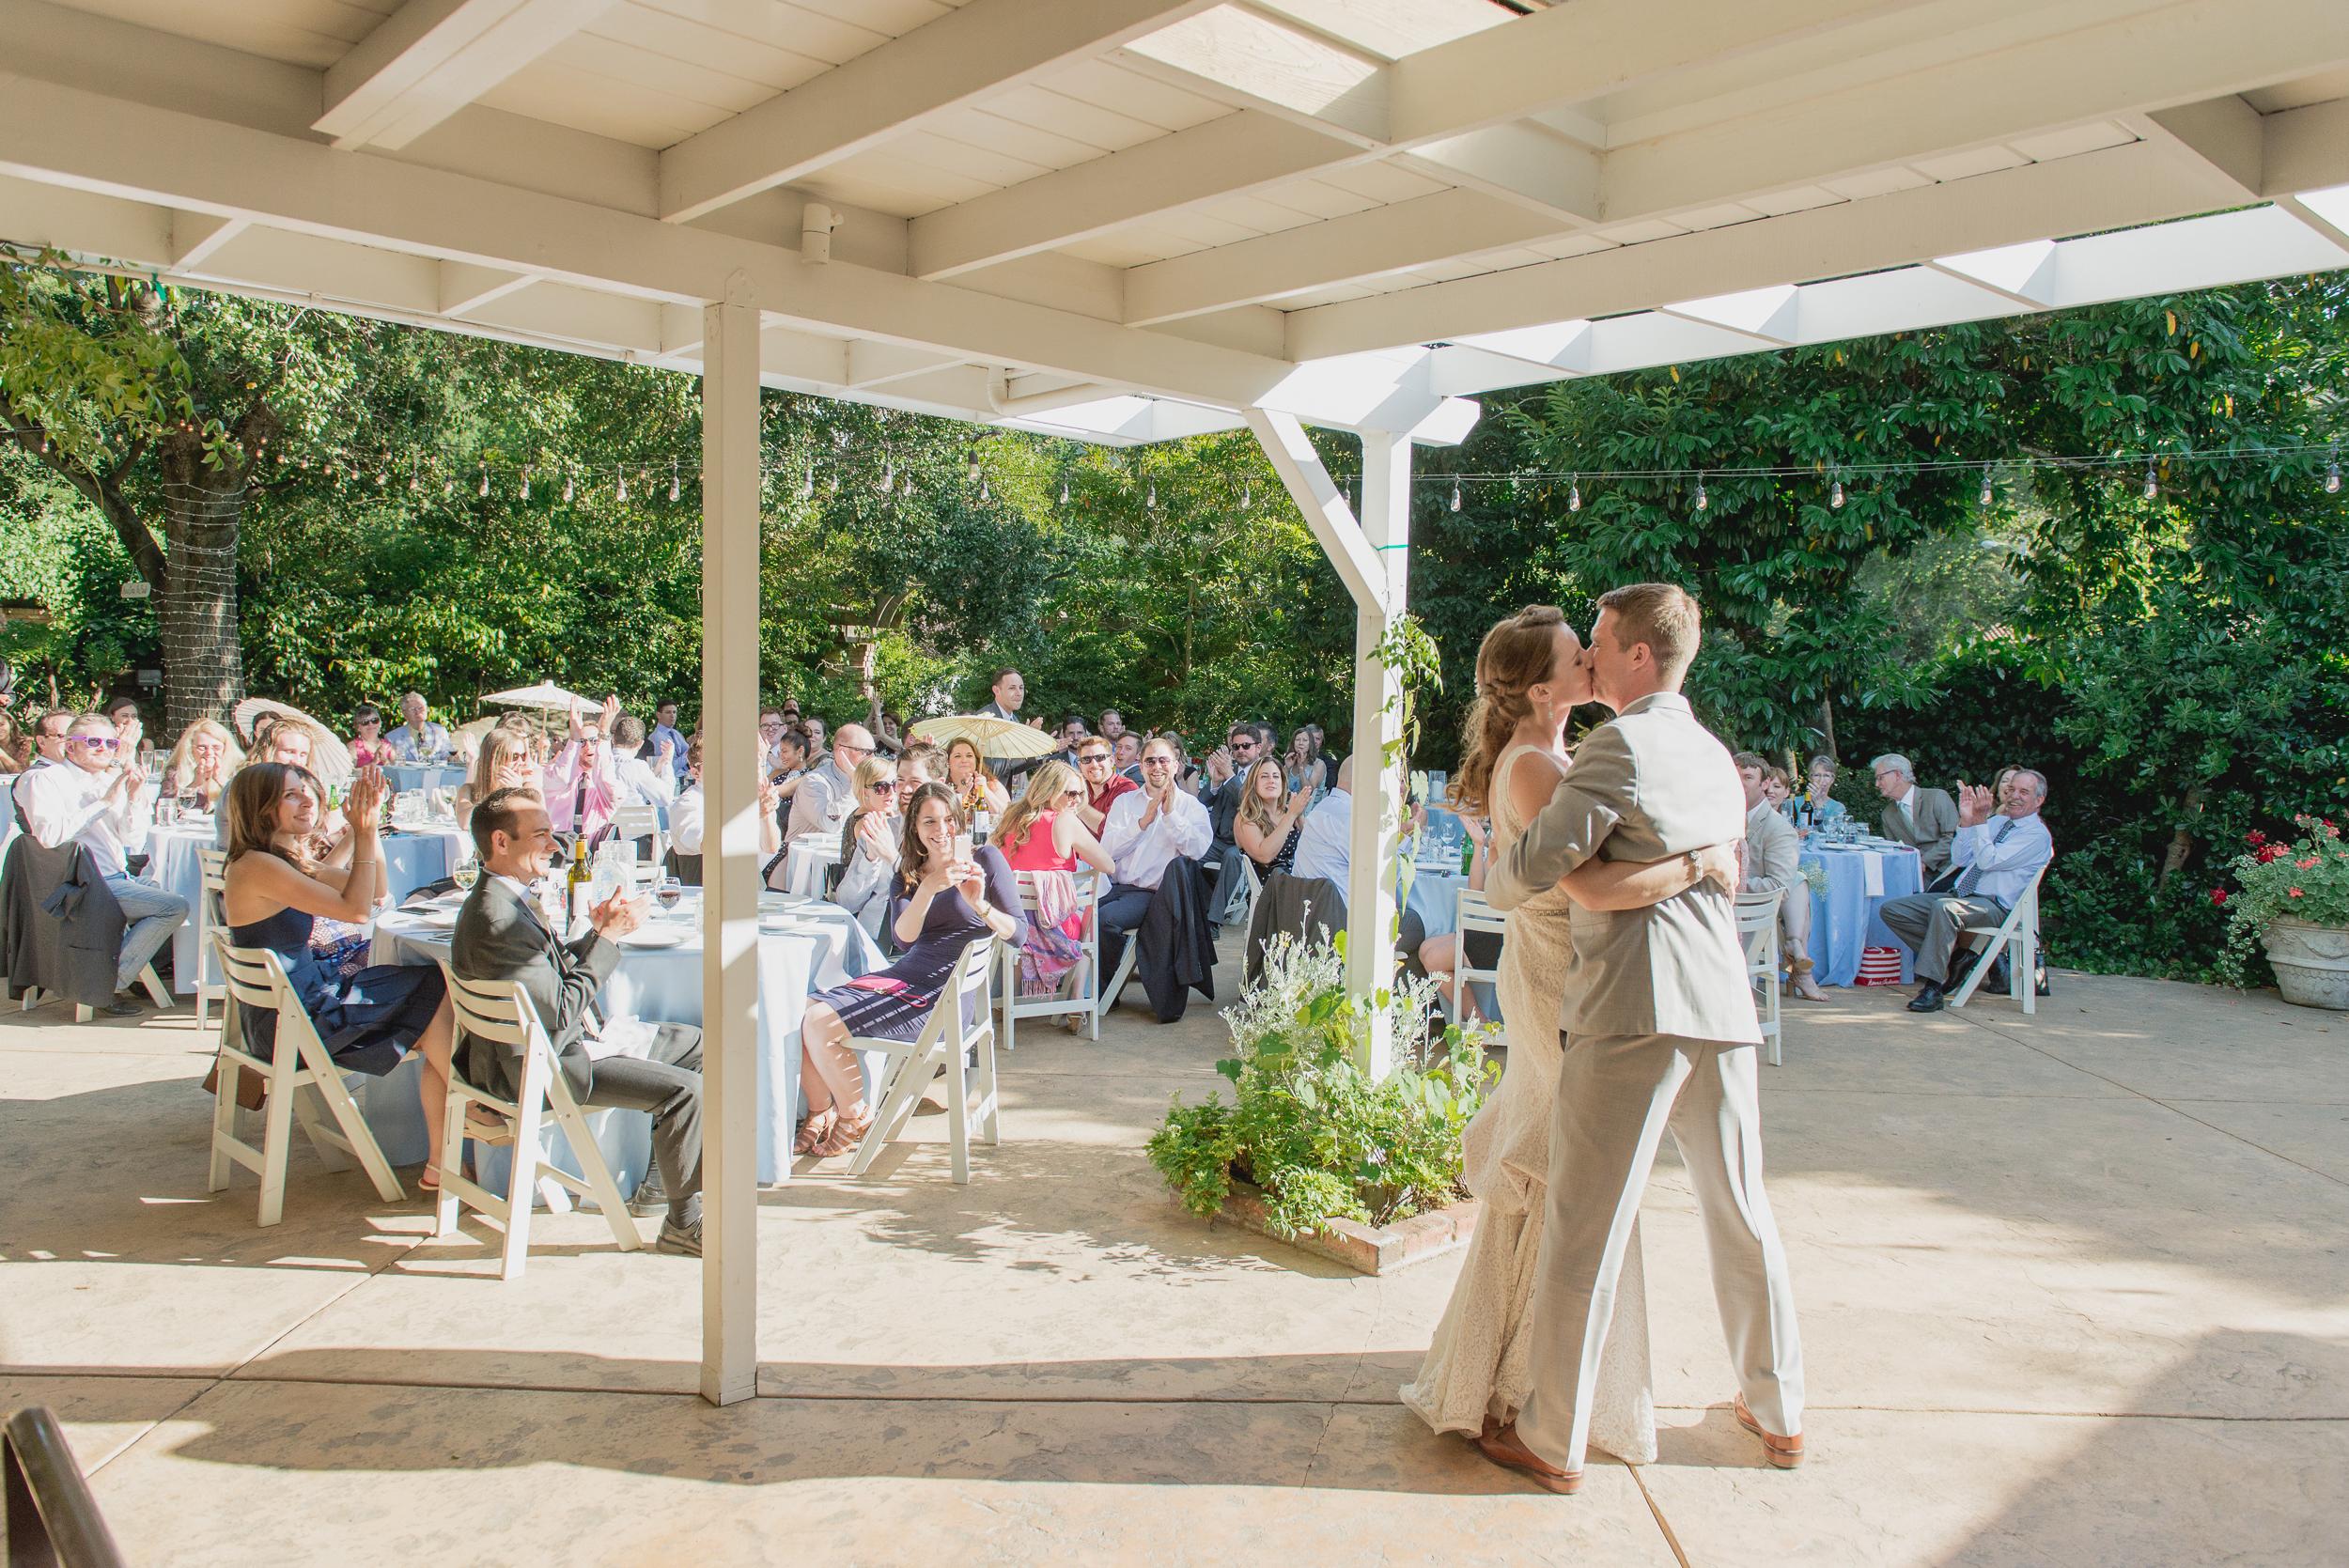 33-down-to-earth-marin-art-garden-center-wedding-vivianchen.jpg